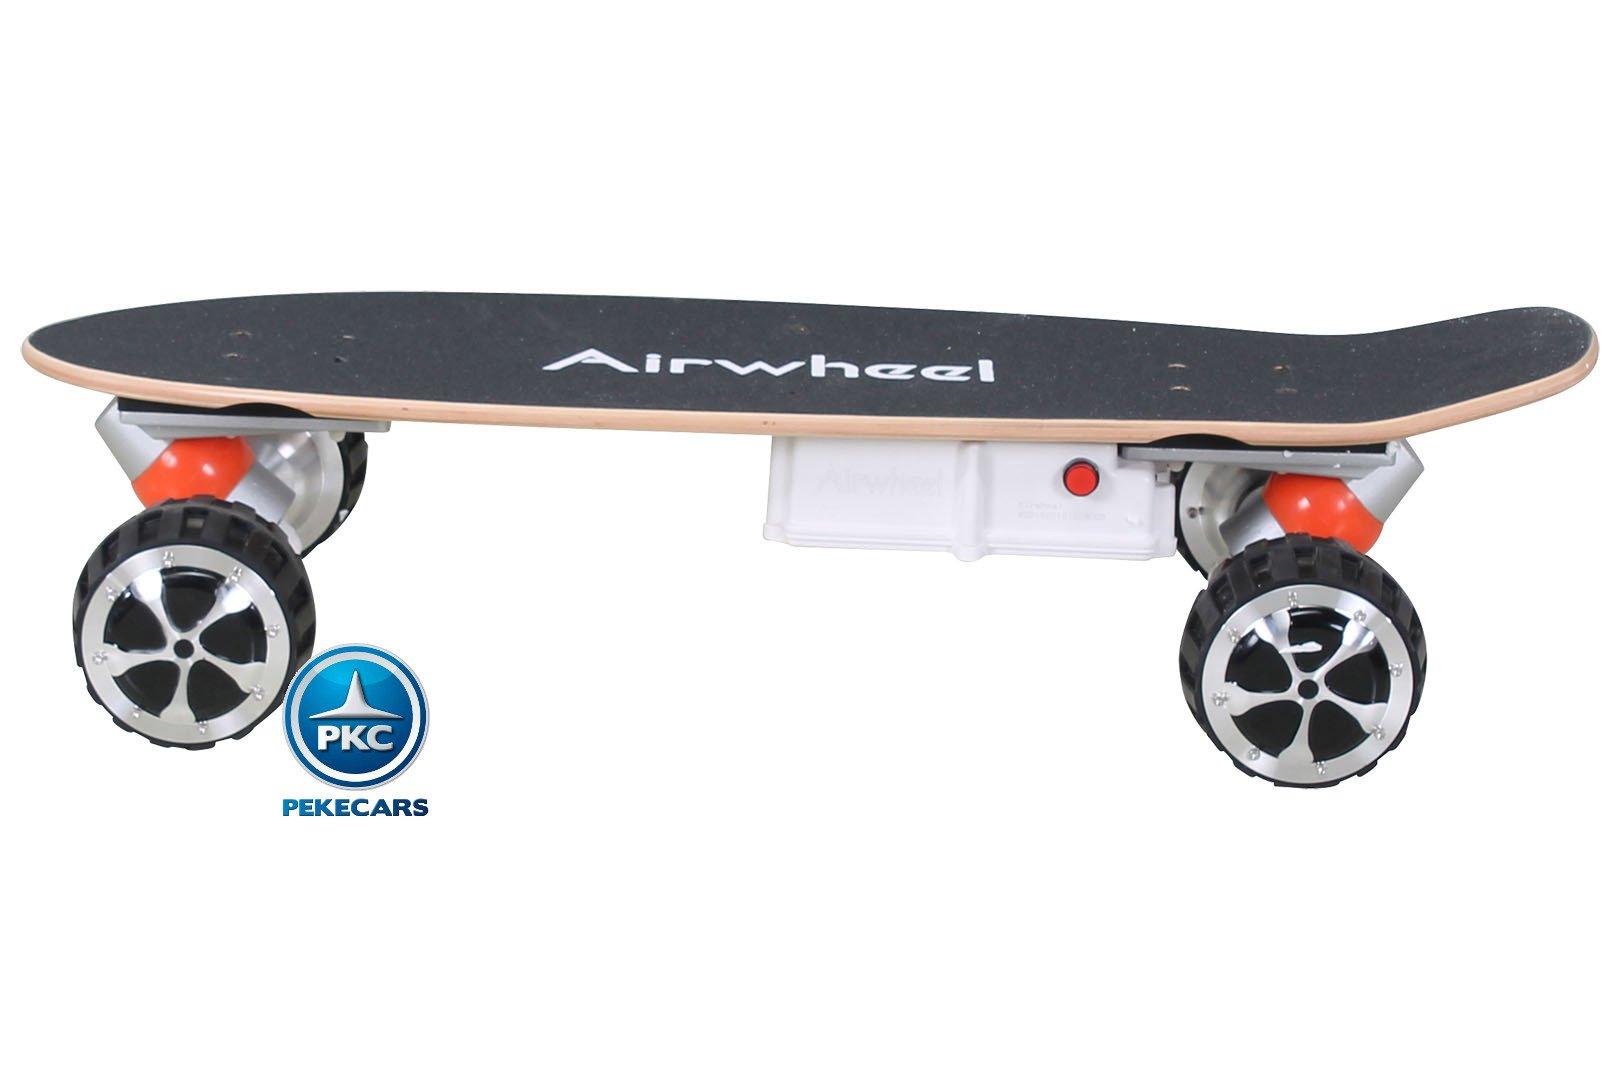 SKATEBOARD AIRWHEEL M3 350W 36V NEGRO 2.4G